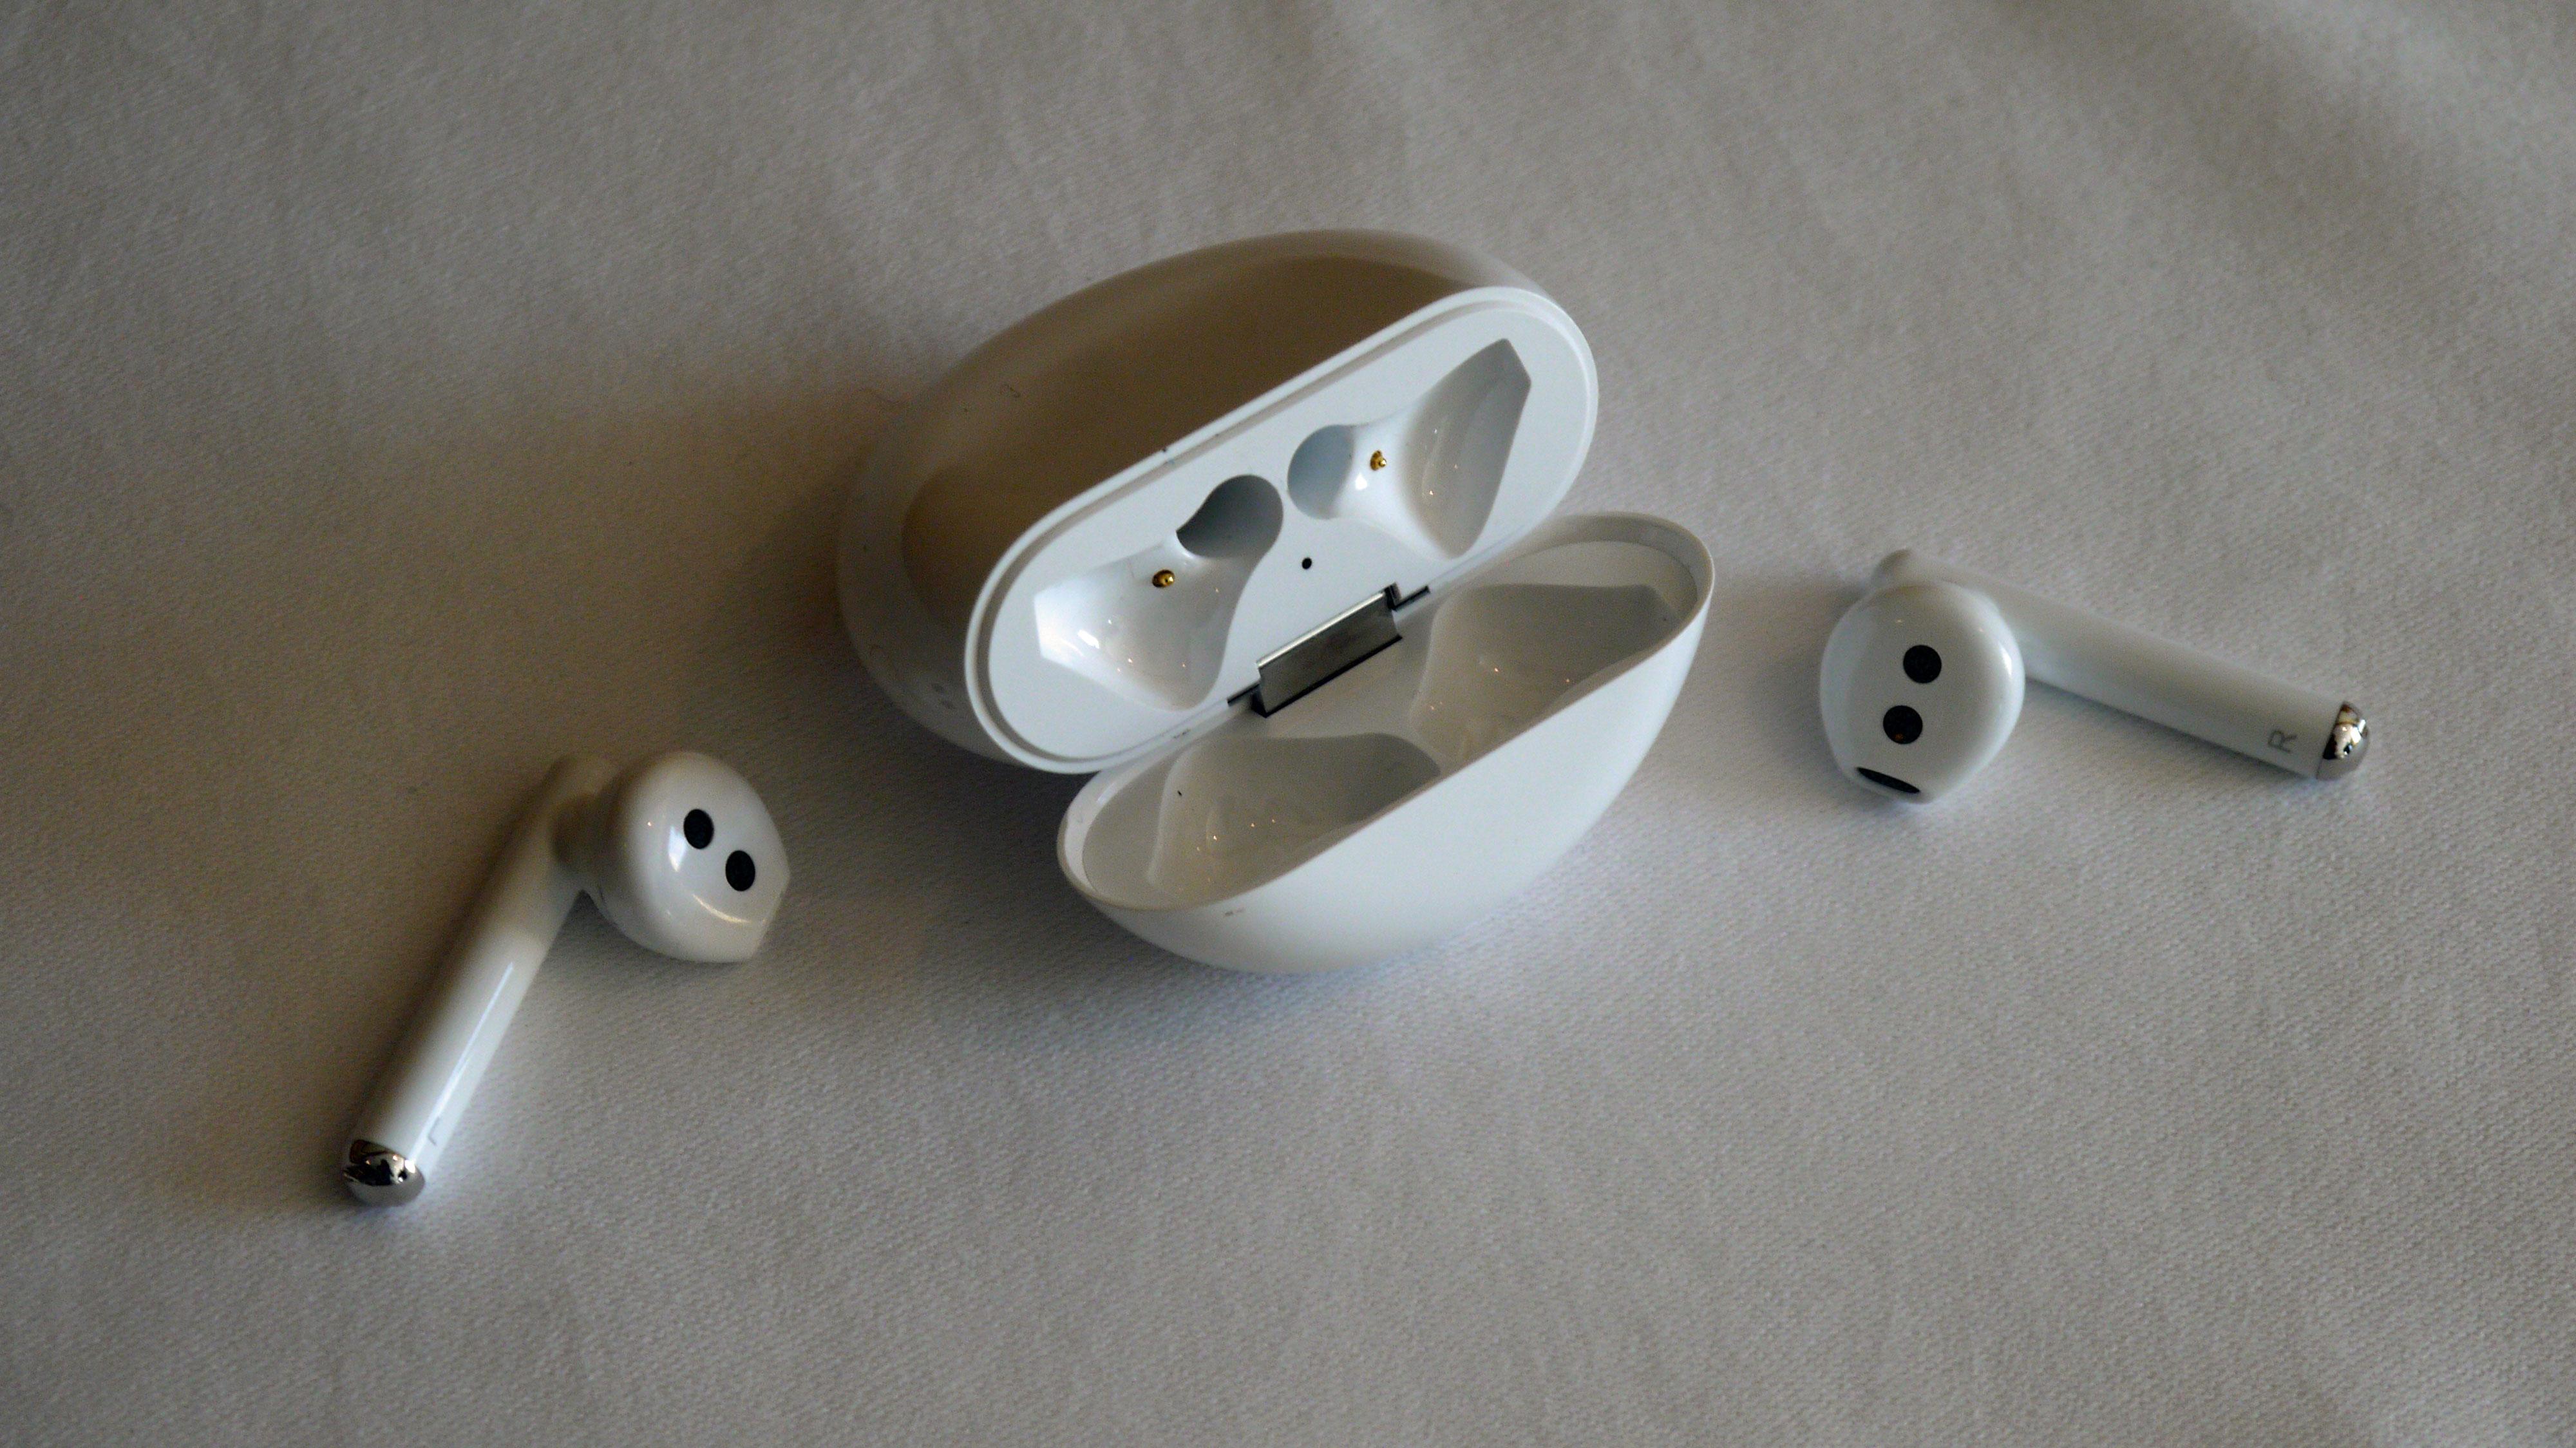 Huawei FreeBuds 3 are ready to take on Apple AirPods | TechRadar